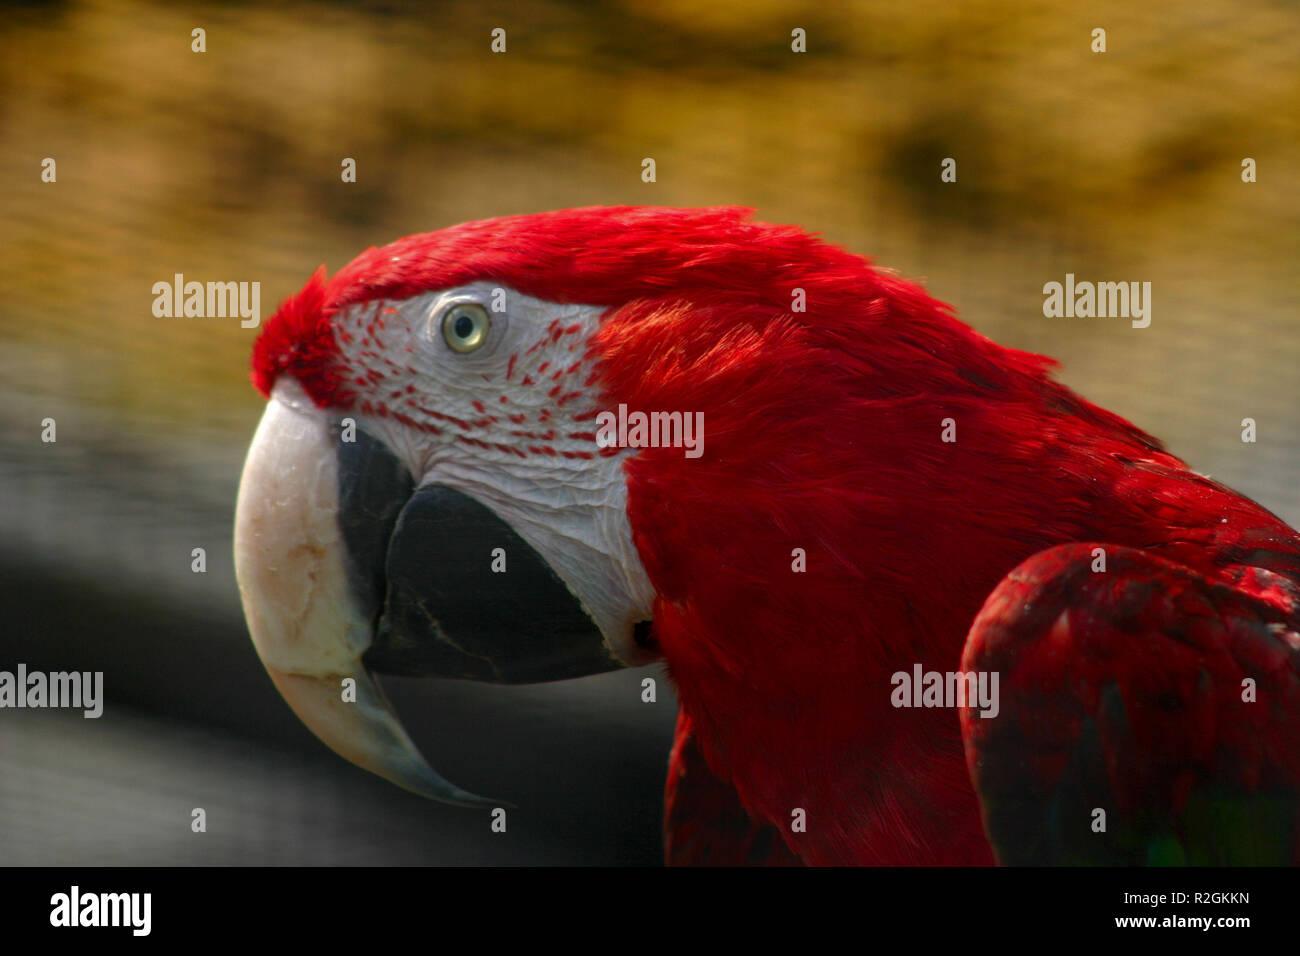 Sprachbegabt Stock Photos Sprachbegabt Stock Images Alamy